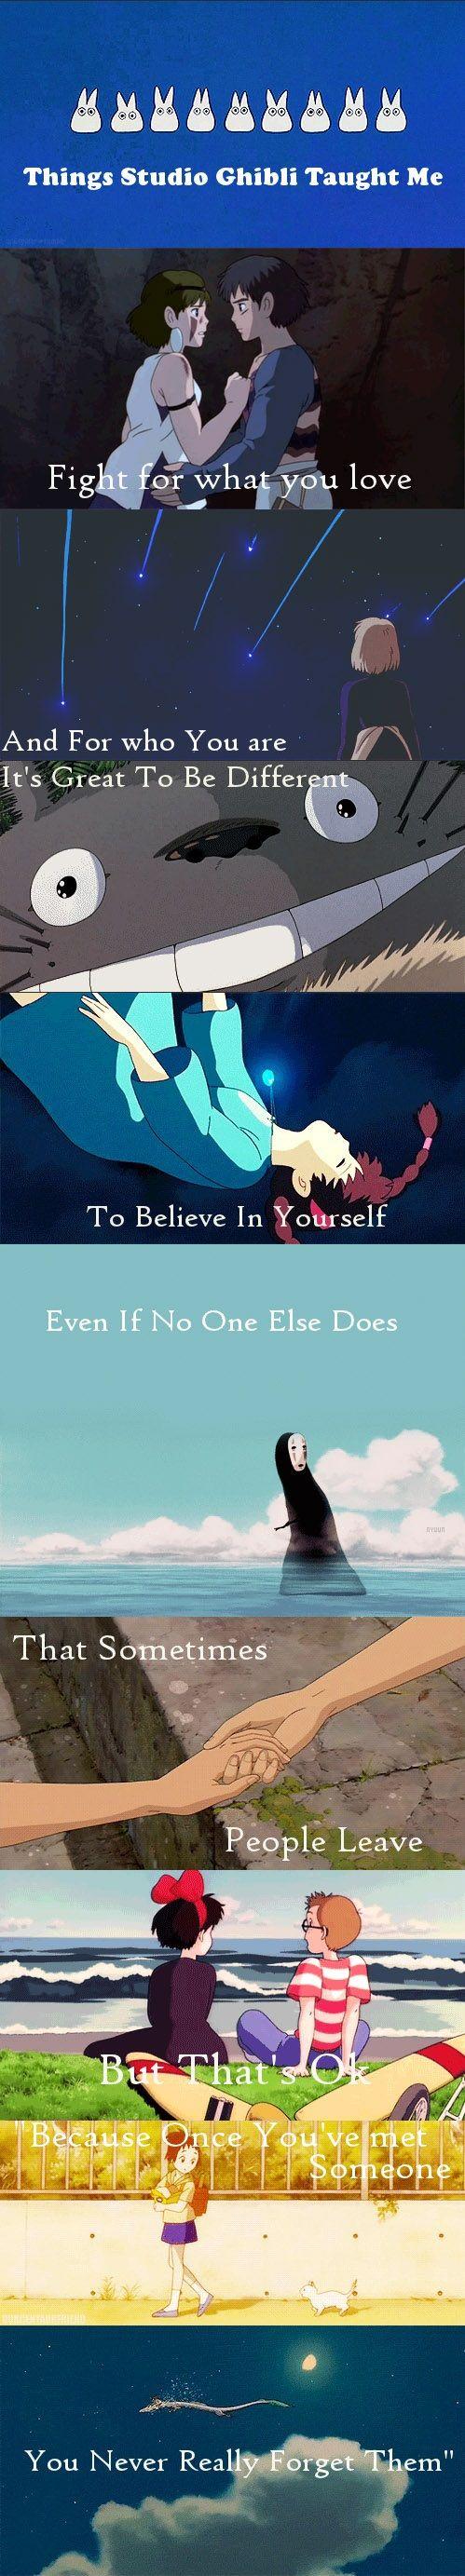 Things Studio Ghibli Taught Me:  Princess Mononoke, Howl's Moving Castle, My Neighbor Totoro, Laputa: Castle in the Sky, Spirited